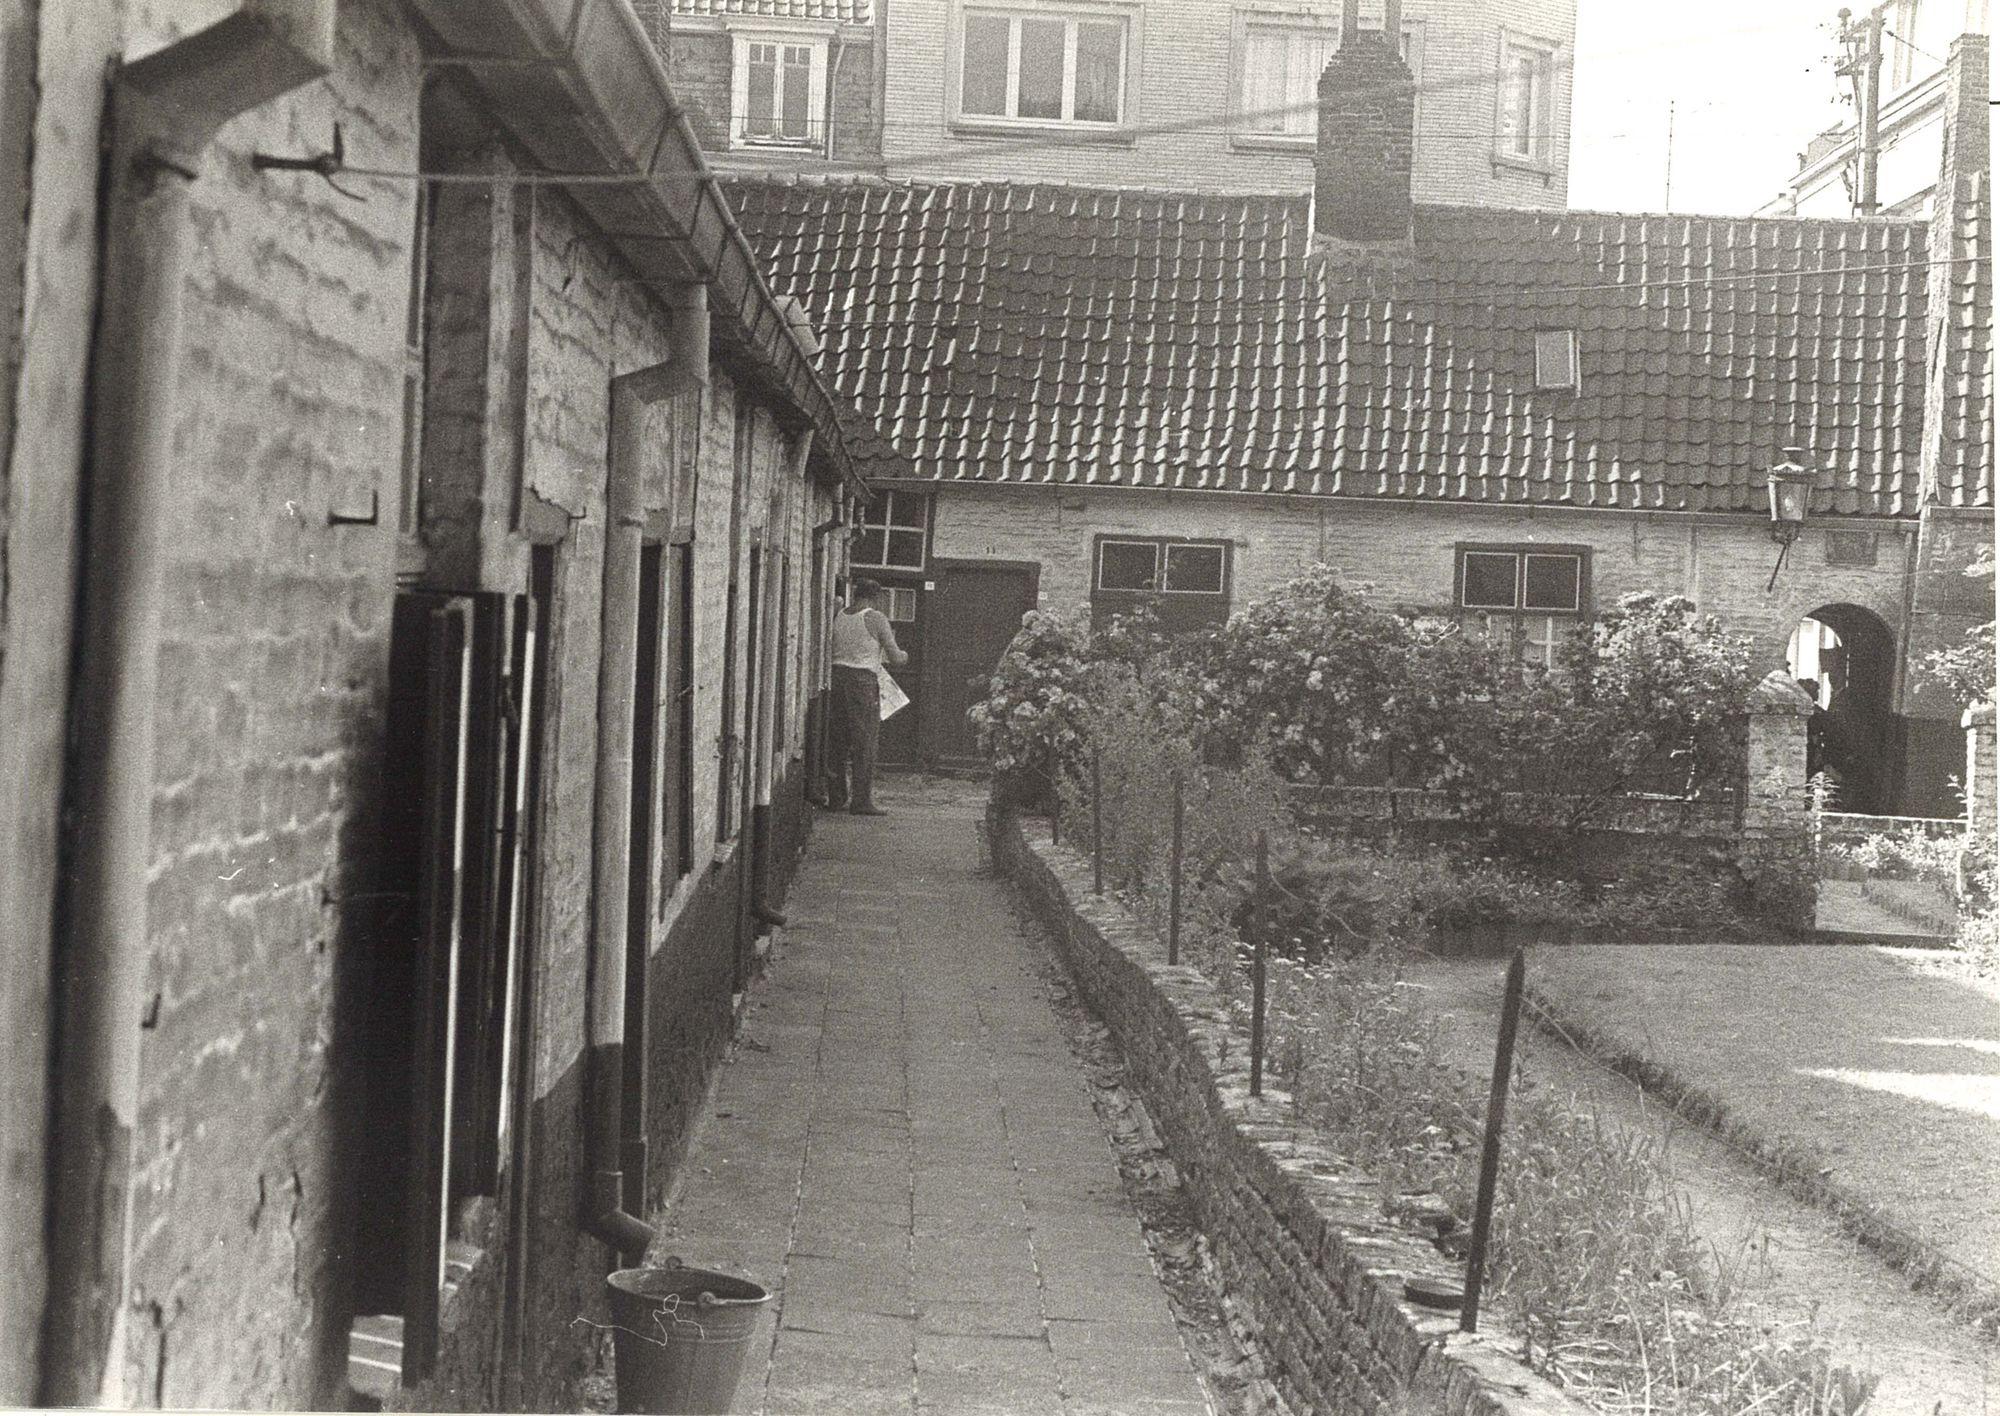 Baggaertshof in de Sint-Jansstraat 1975